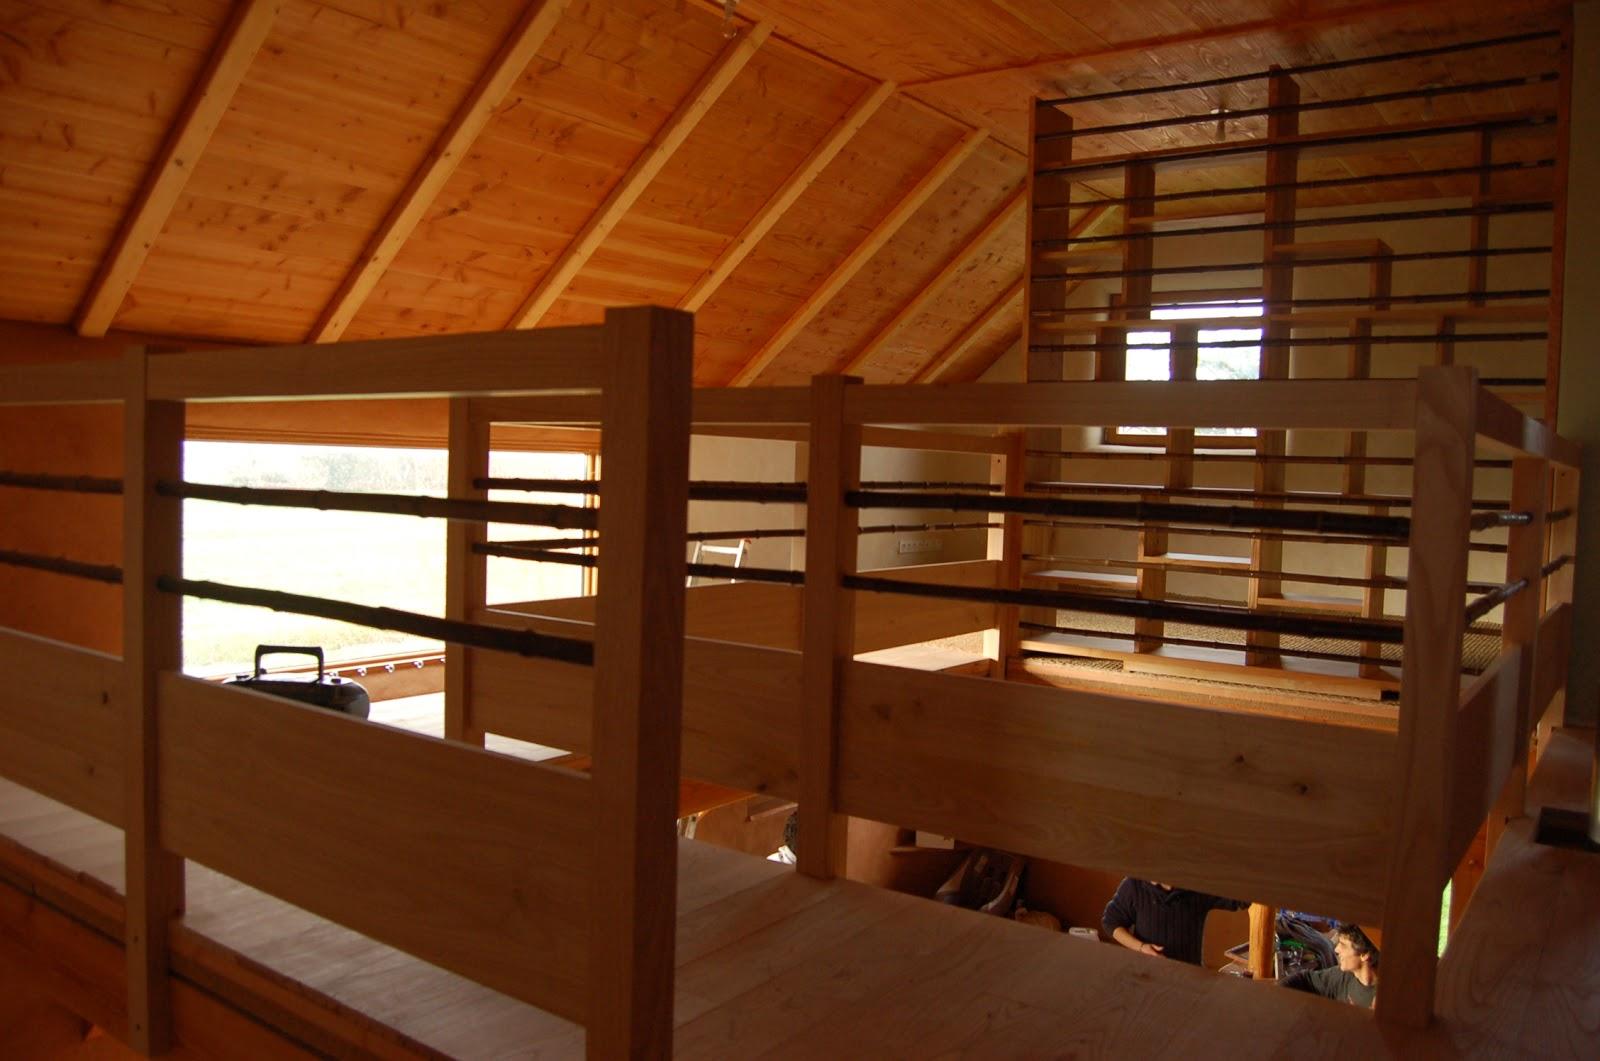 kamastenpaille rambardes du vide sur s jour. Black Bedroom Furniture Sets. Home Design Ideas